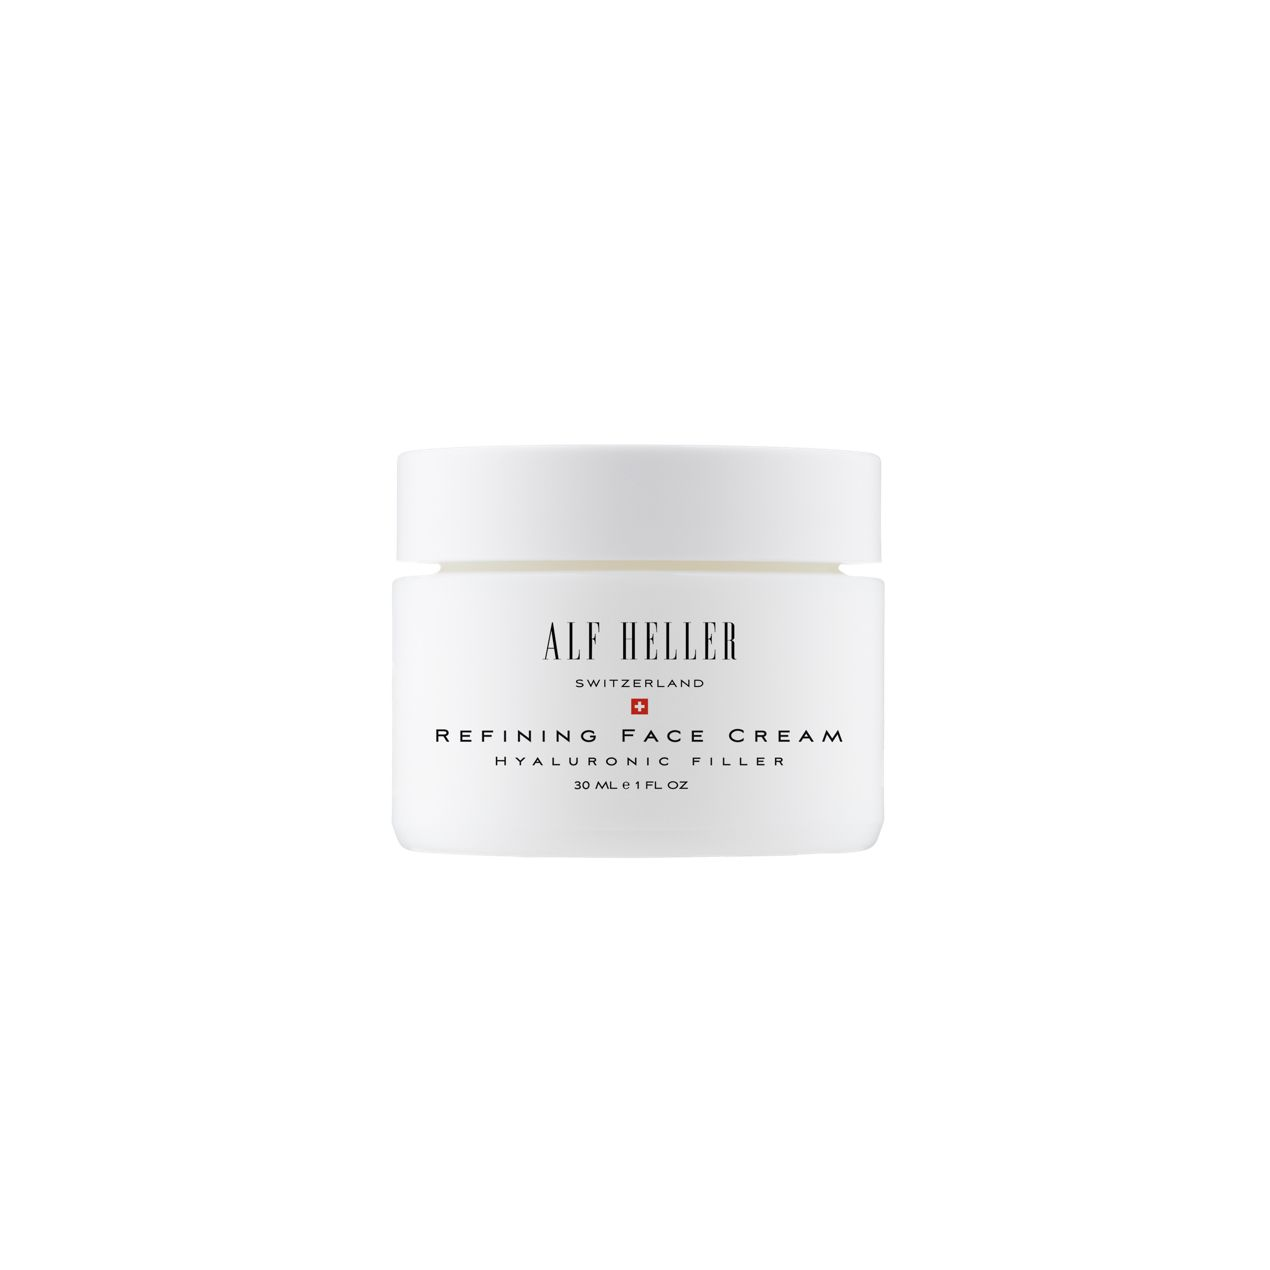 Alf Heller Switzerland-REFINING FACE CREAM 30 ml